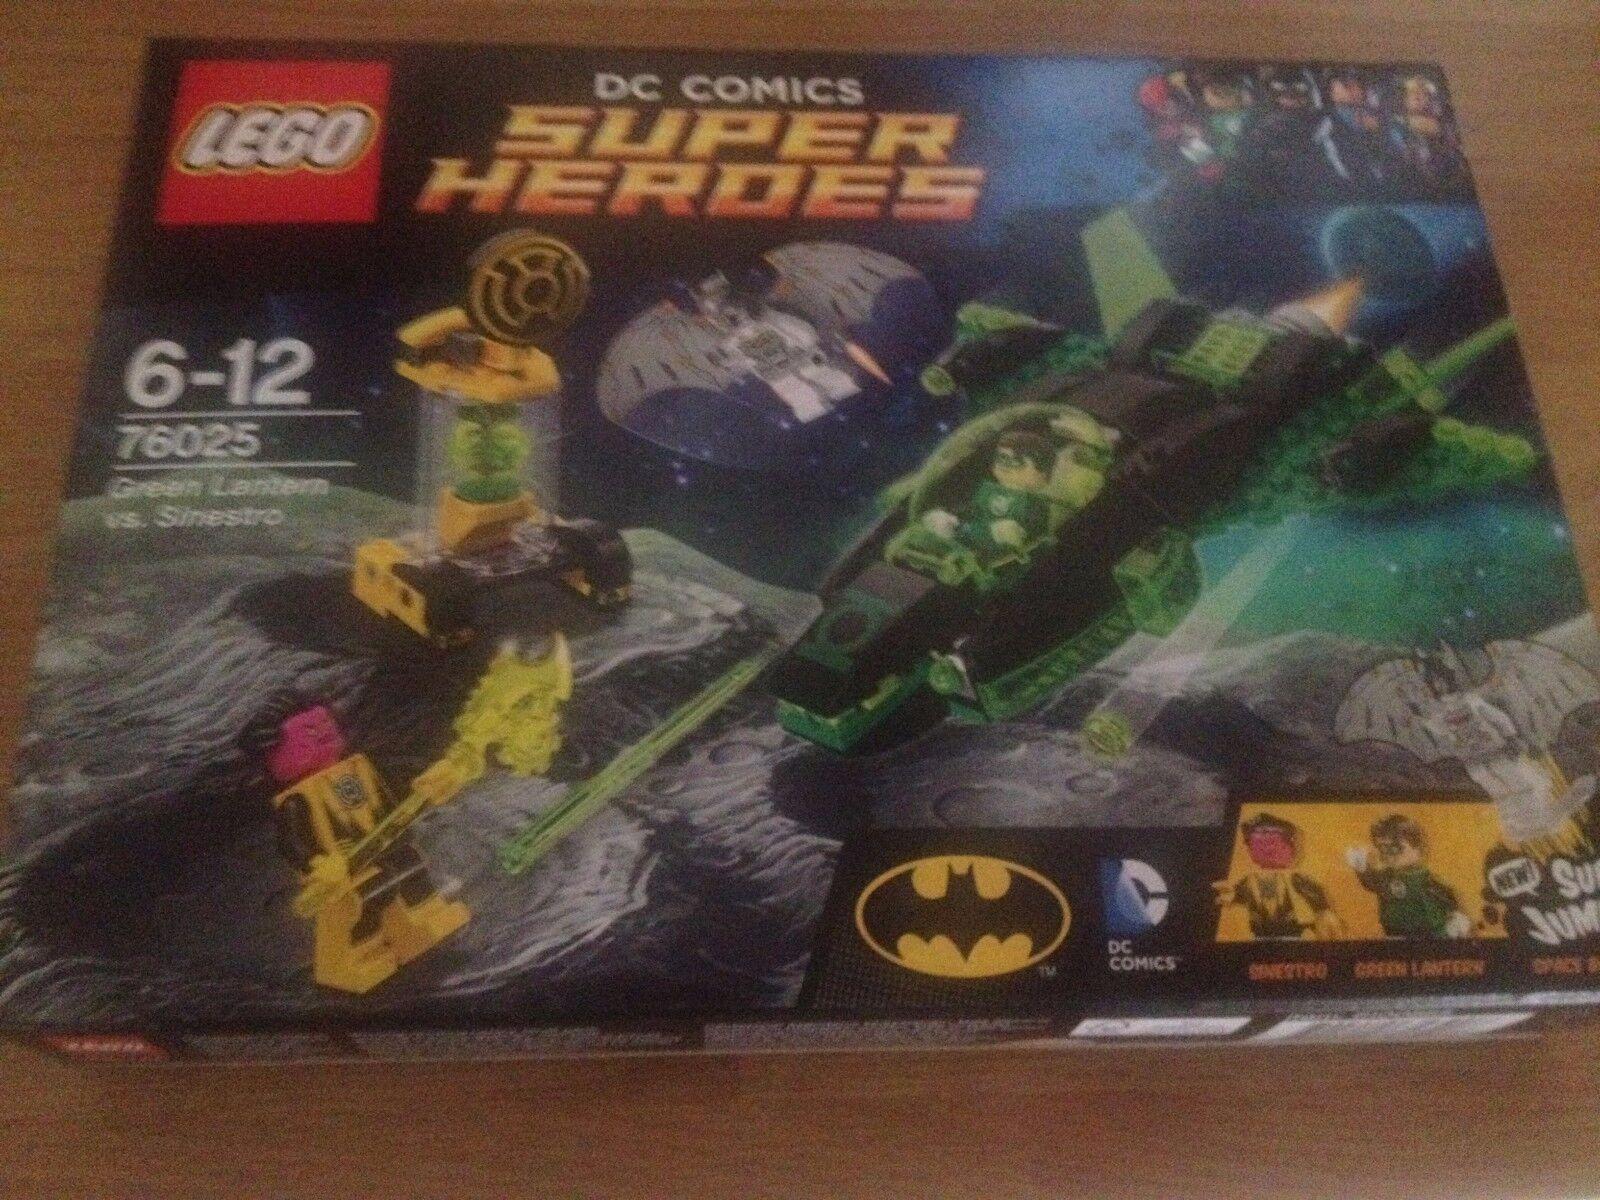 Lego DC SUPER HEROES  76025 Green Lantern vs. Sinestro  Brand new,factory sealed